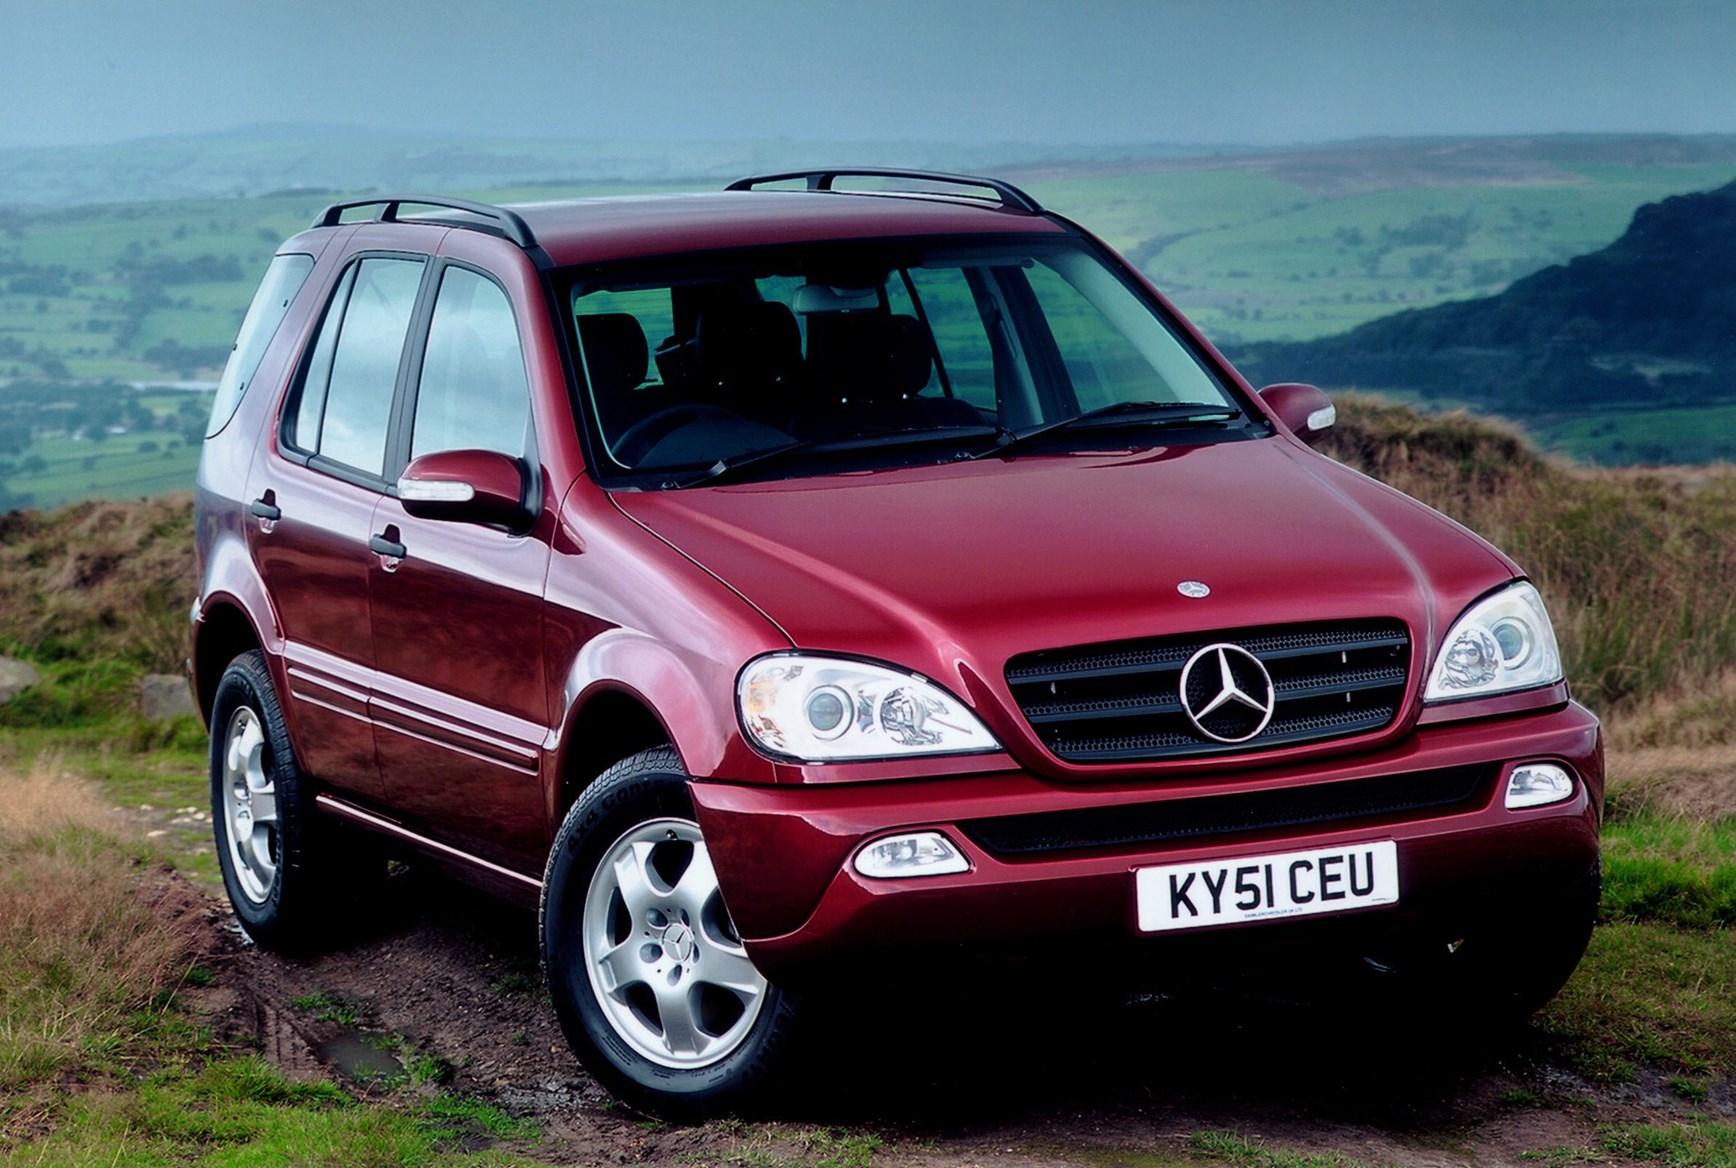 2004 mercedes ml320 2004 mercedes benz m class information and - 2004 Mercedes Ml320 2004 Mercedes Benz M Class Information And 43